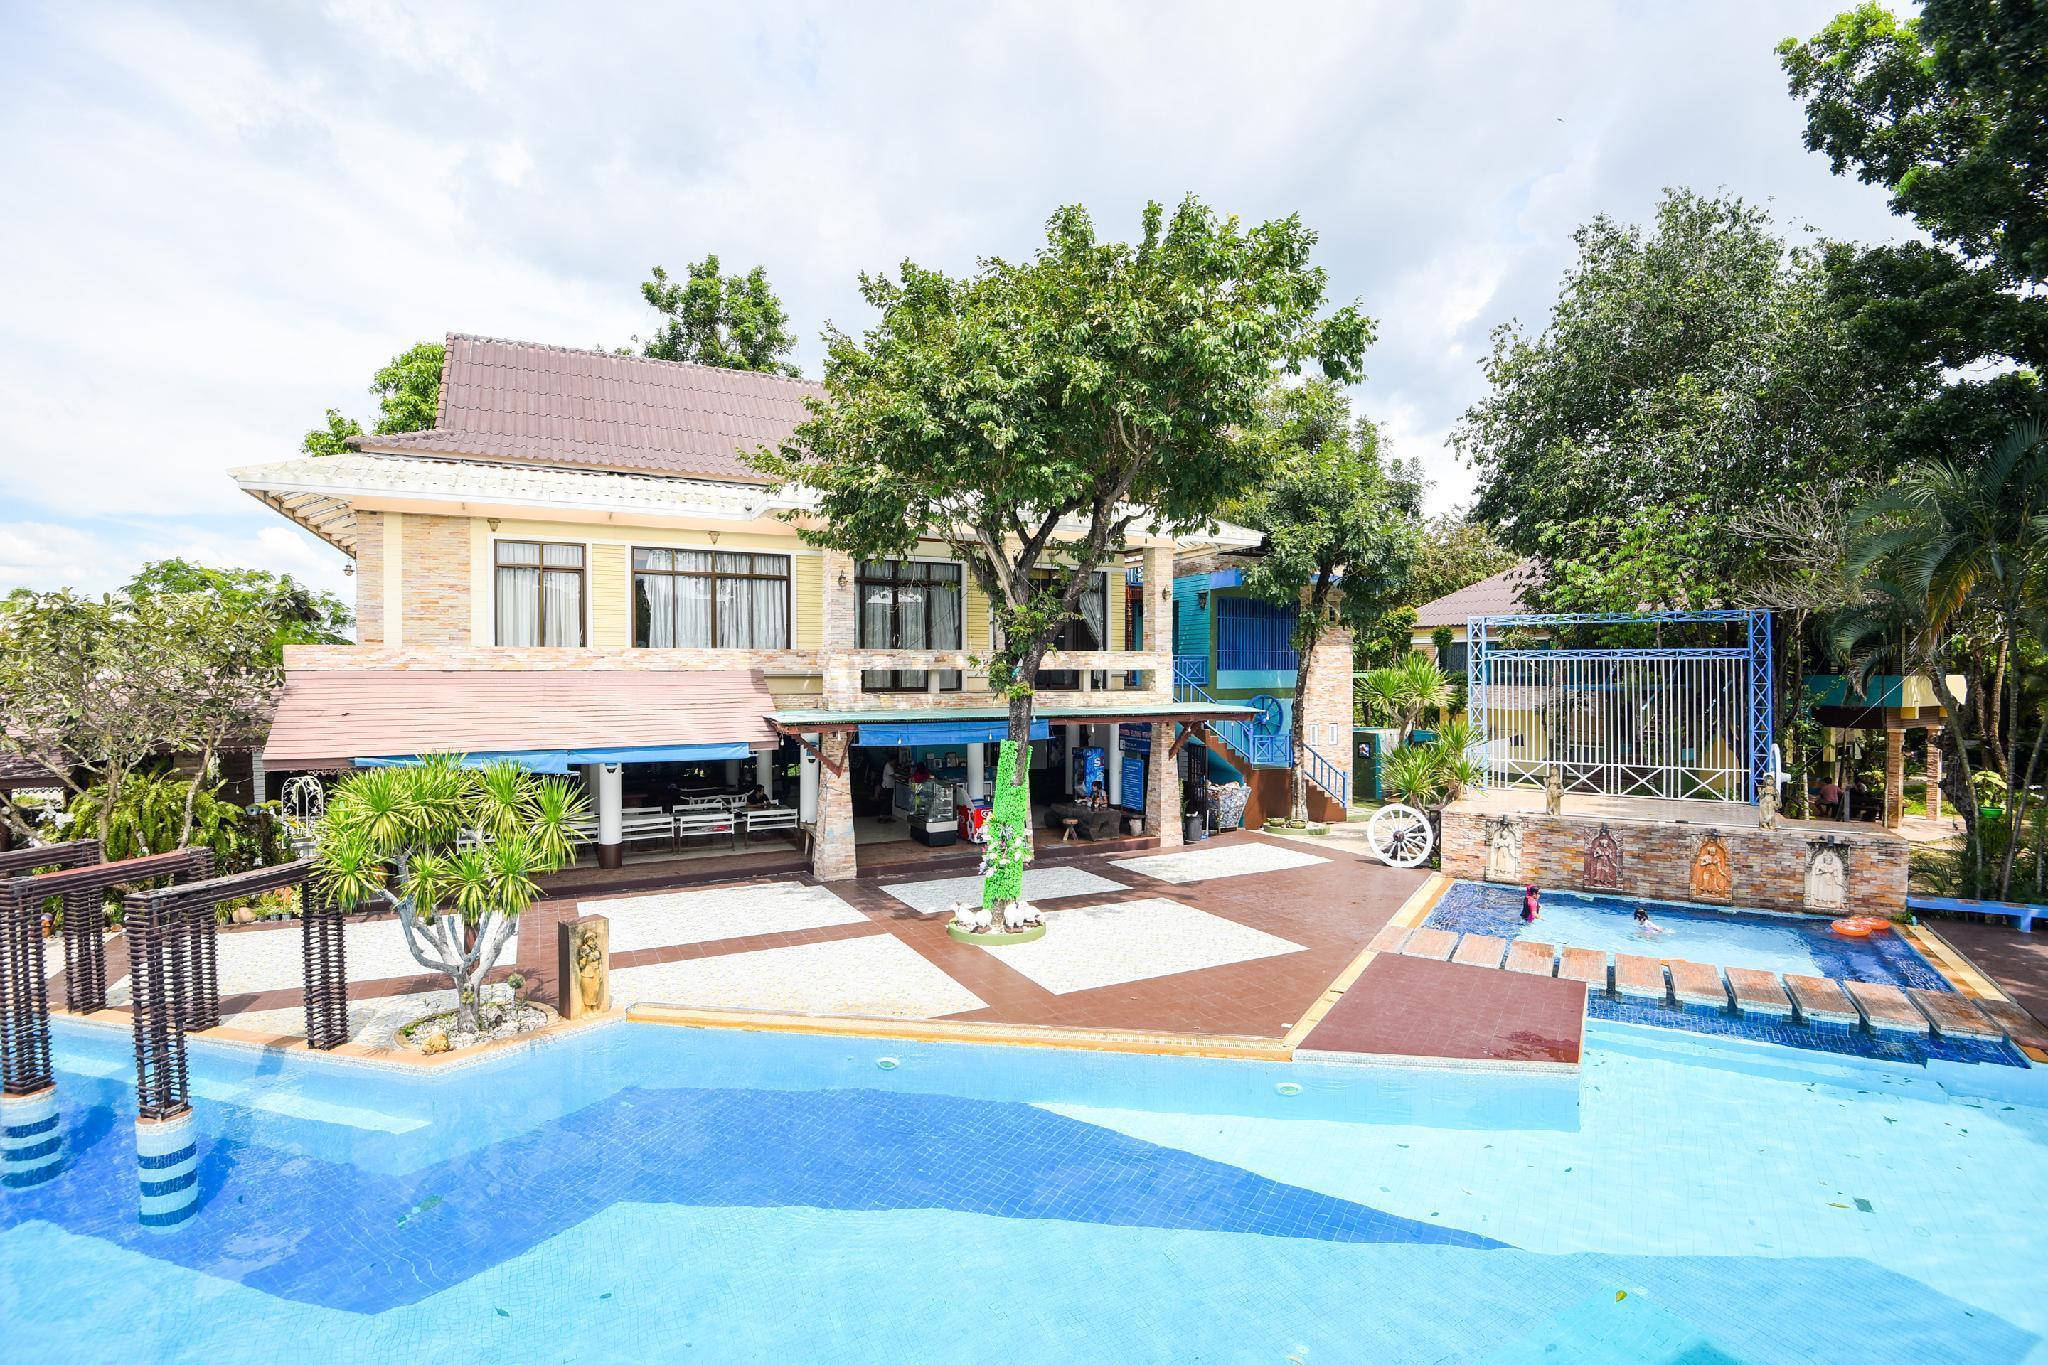 OYO 418 Saksaitarn Resort โอโย 418 ศักดิ์สายธาร รีสอร์ต